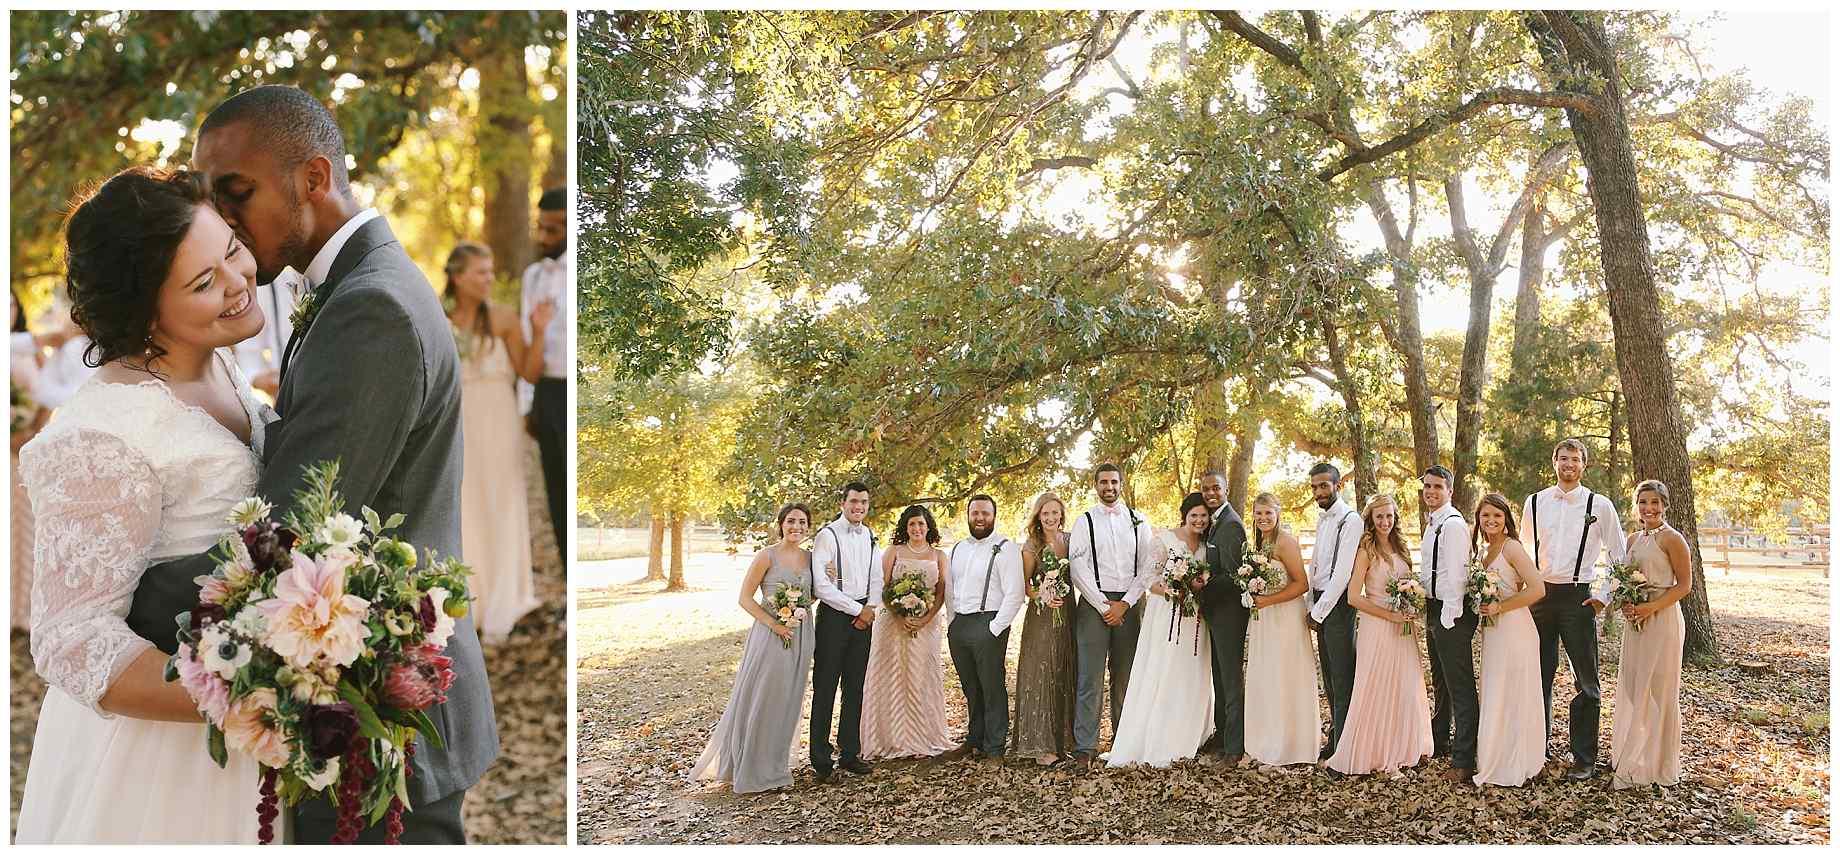 stone-oak-ranch-wedding-002